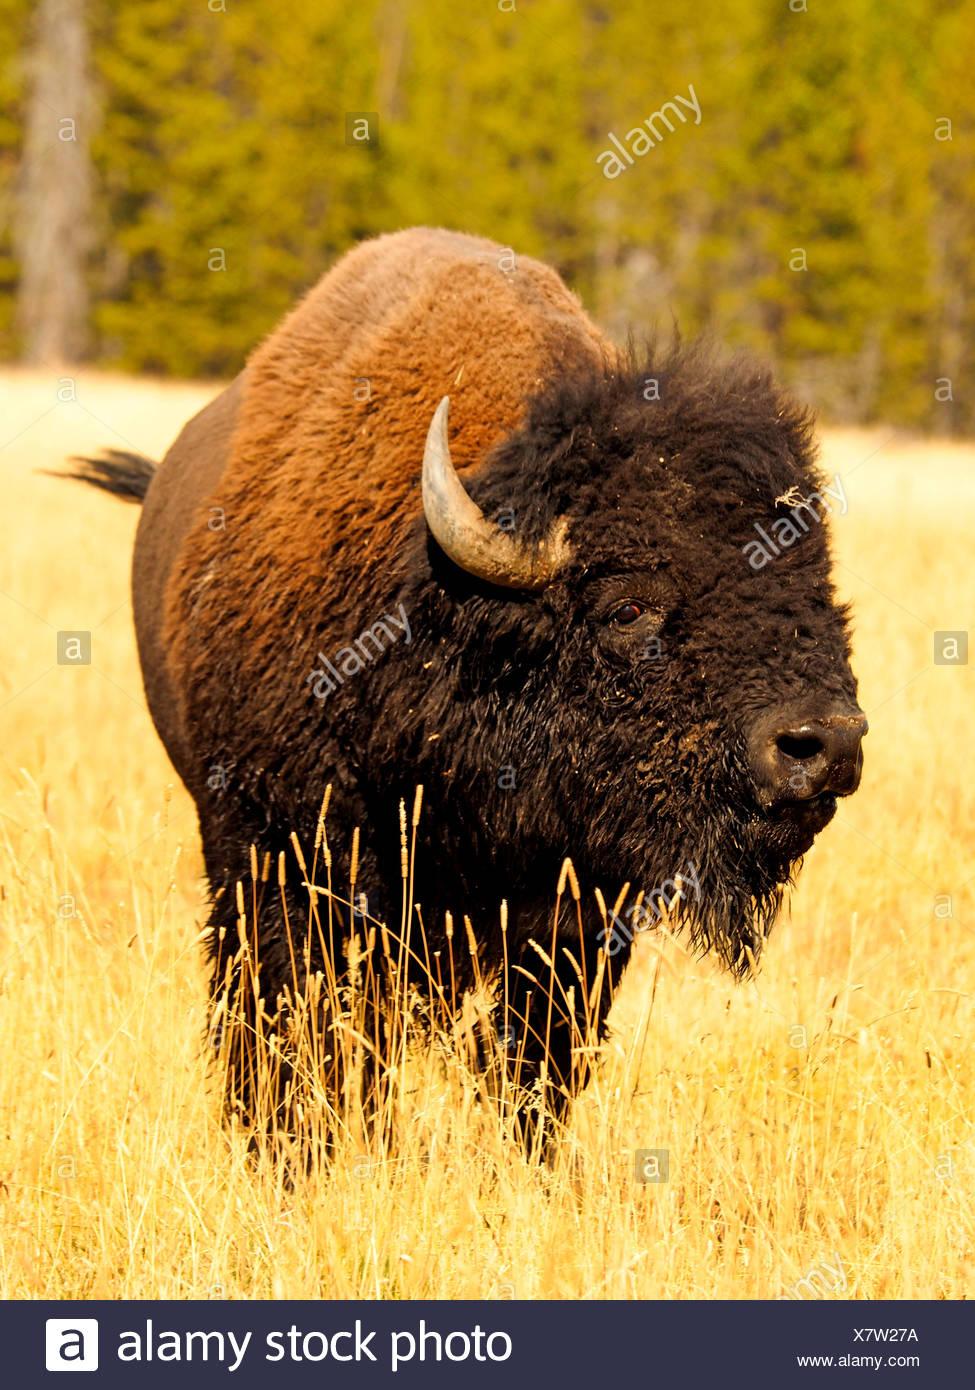 American bison, Bison (Bison bison), Bull, USA, Wyoming, Yellowstone National Park, Hayden Valley Banque D'Images